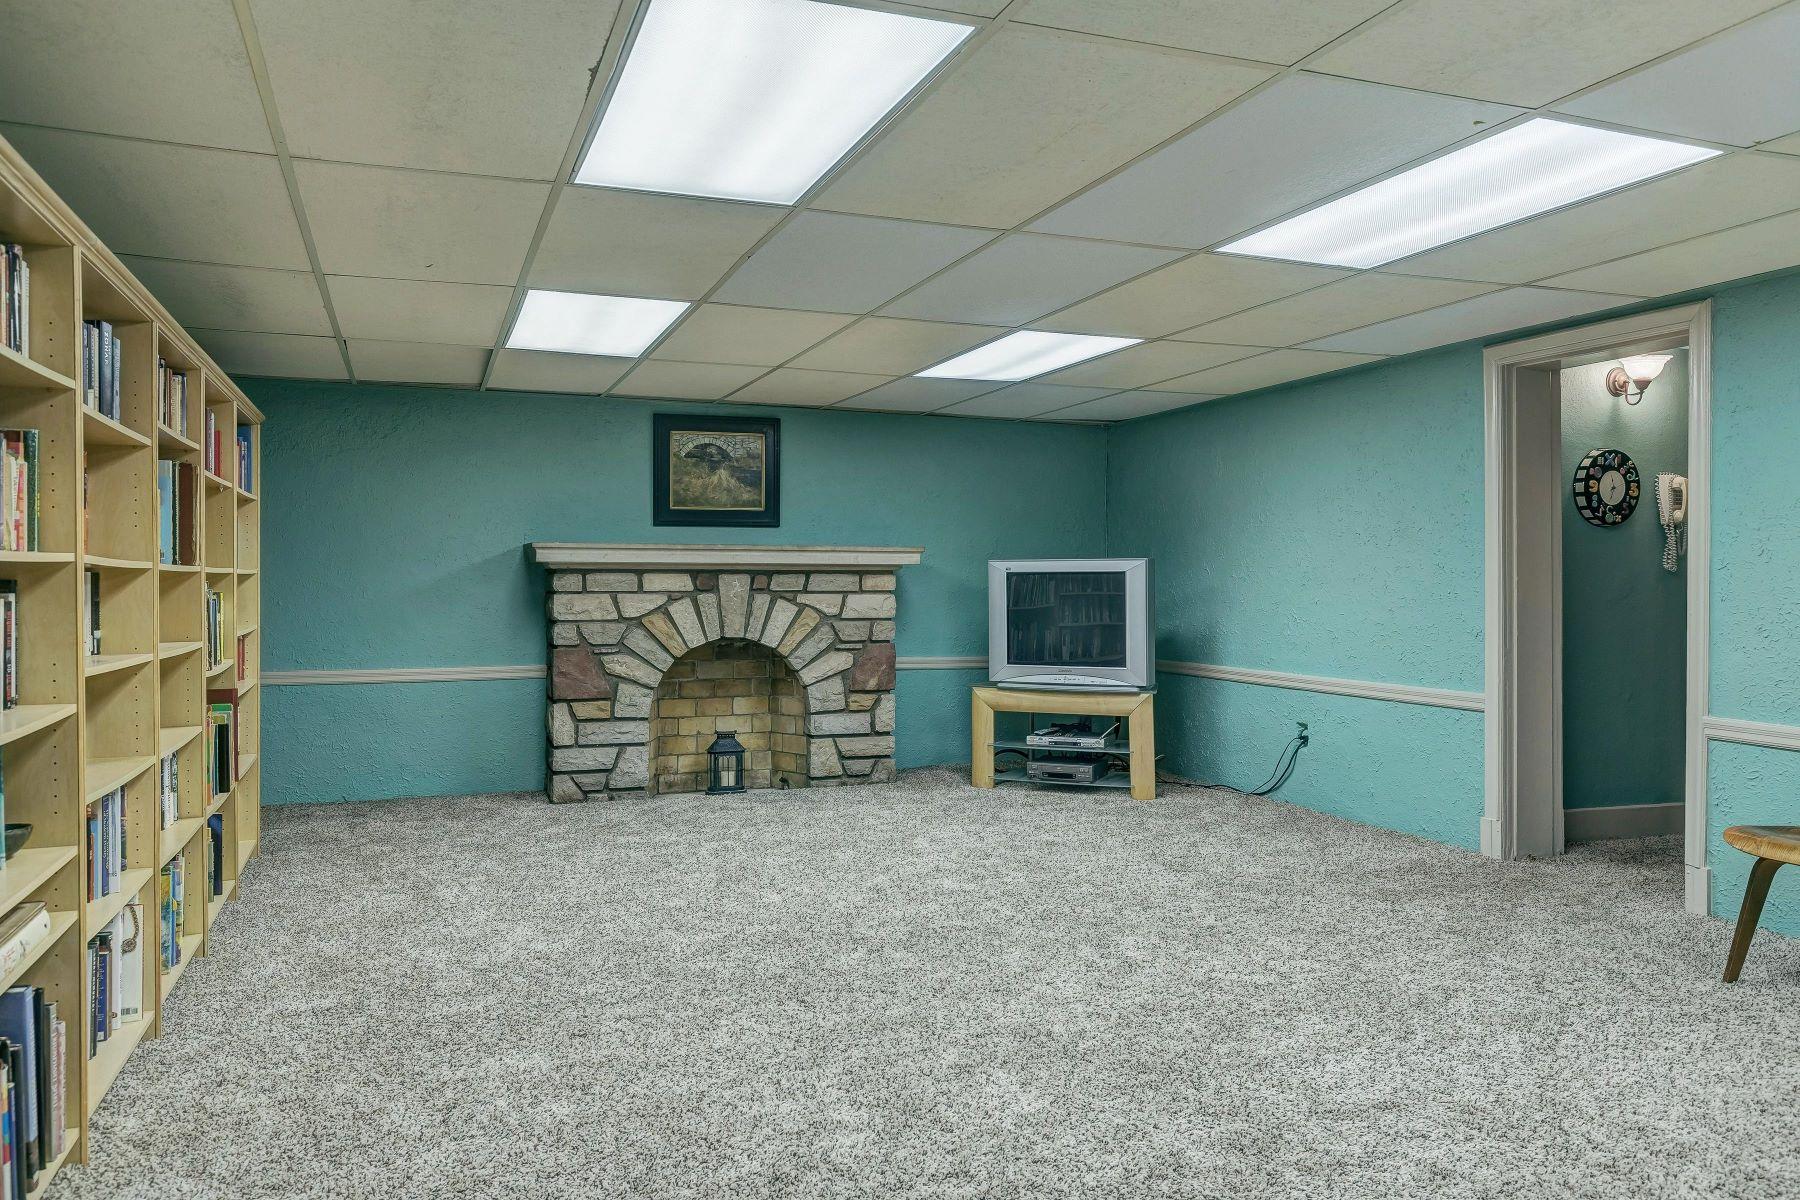 Additional photo for property listing at Stately Ladue Residence 9107 Clayton Road Ladue, Missouri 63124 United States